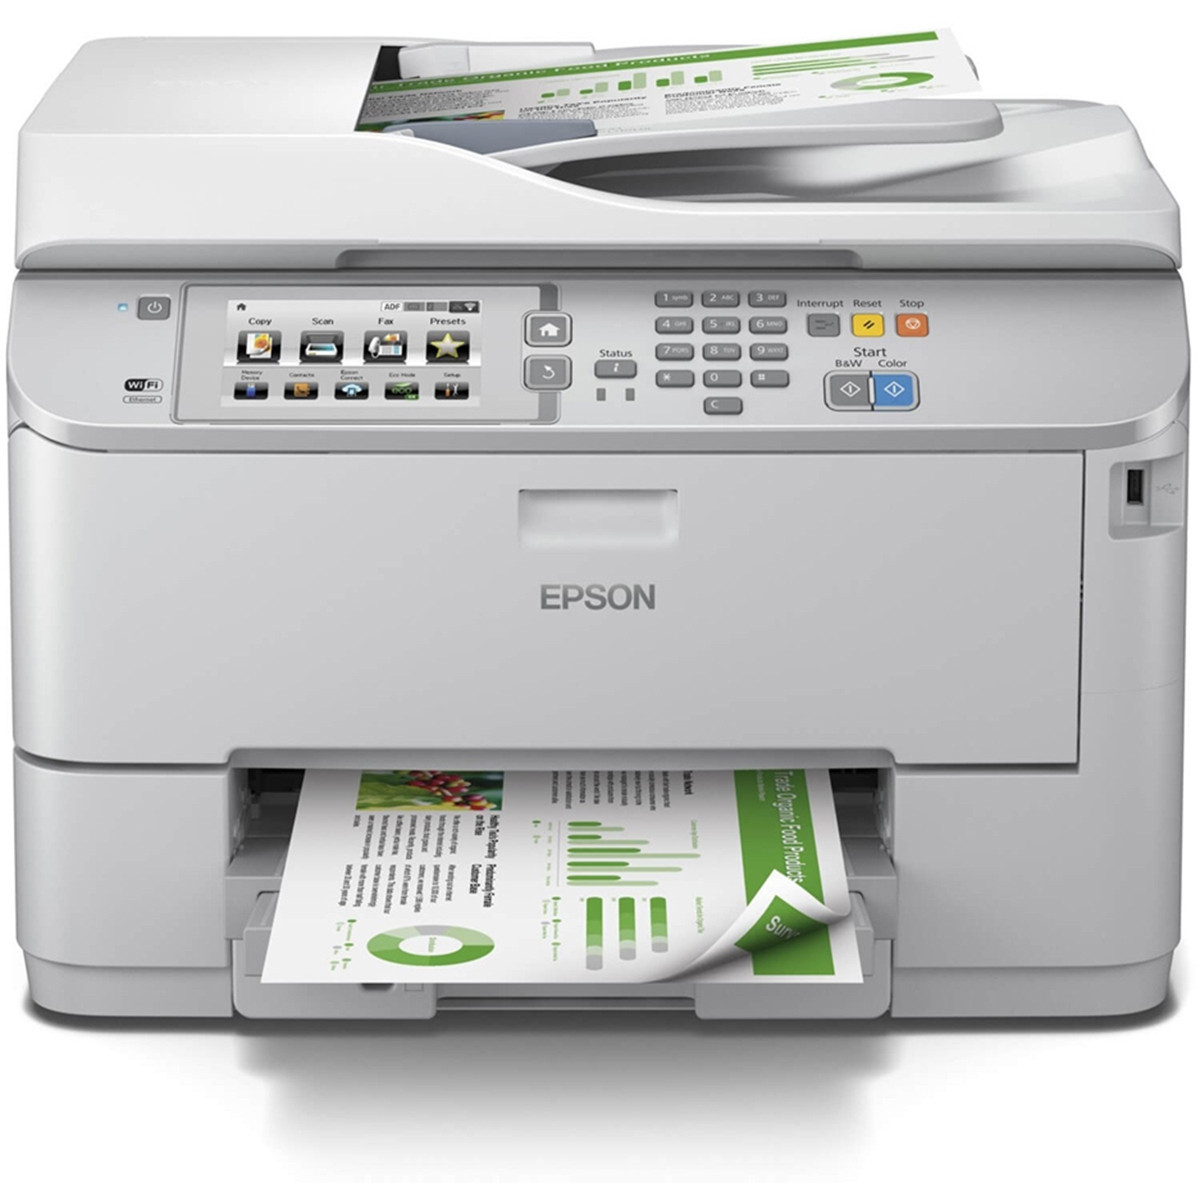 Impressora Epson WorkForce WF-5690 Multifuncional com Wireless Duplex e ADF